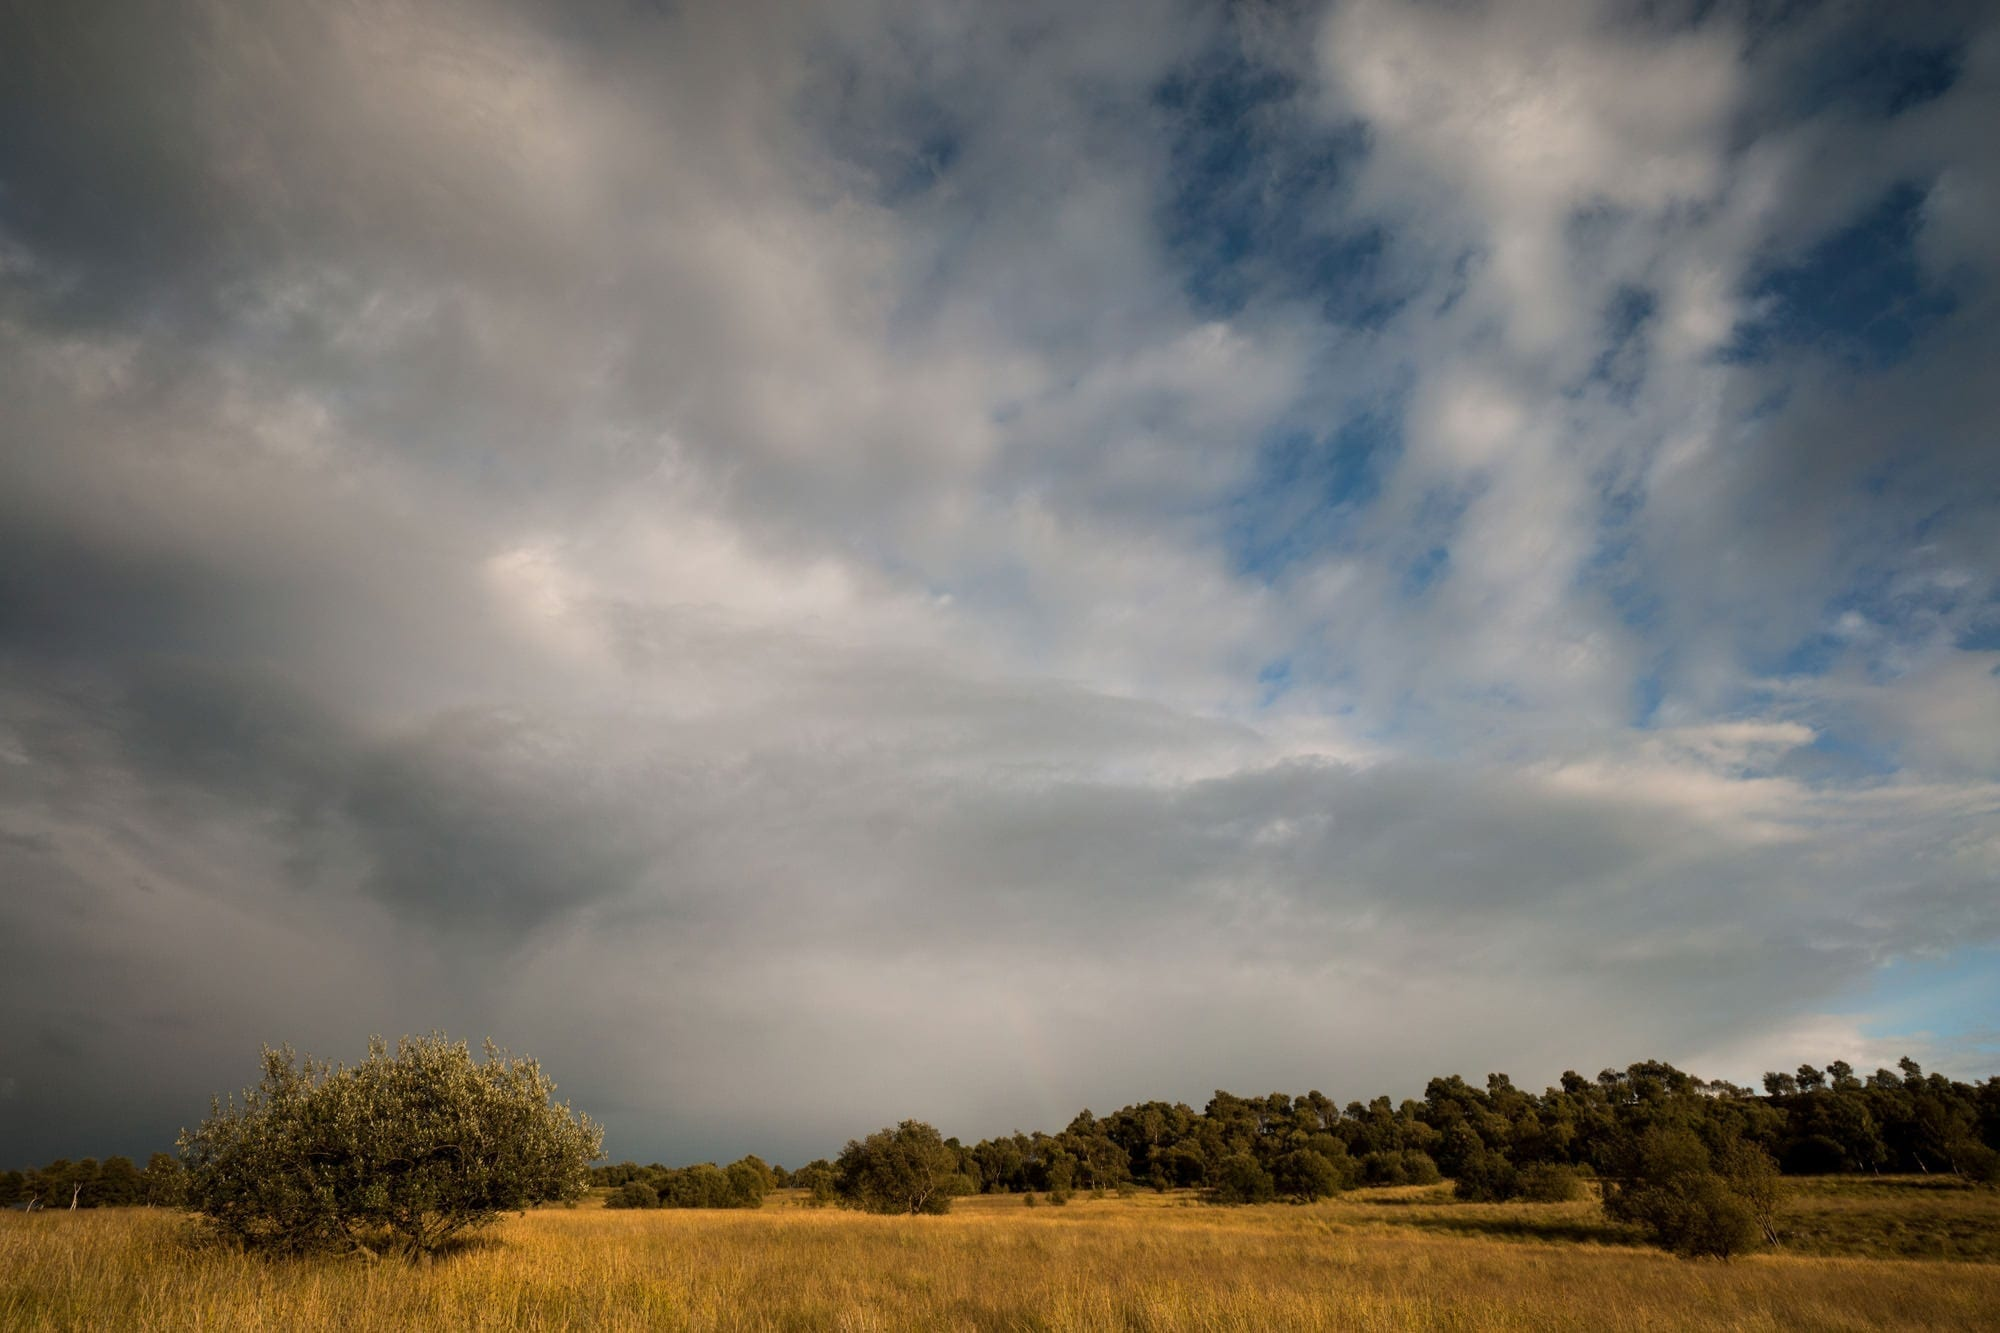 Birchen Edge Stormy Skies - Gritstone Edges Peak District Photography Workshop